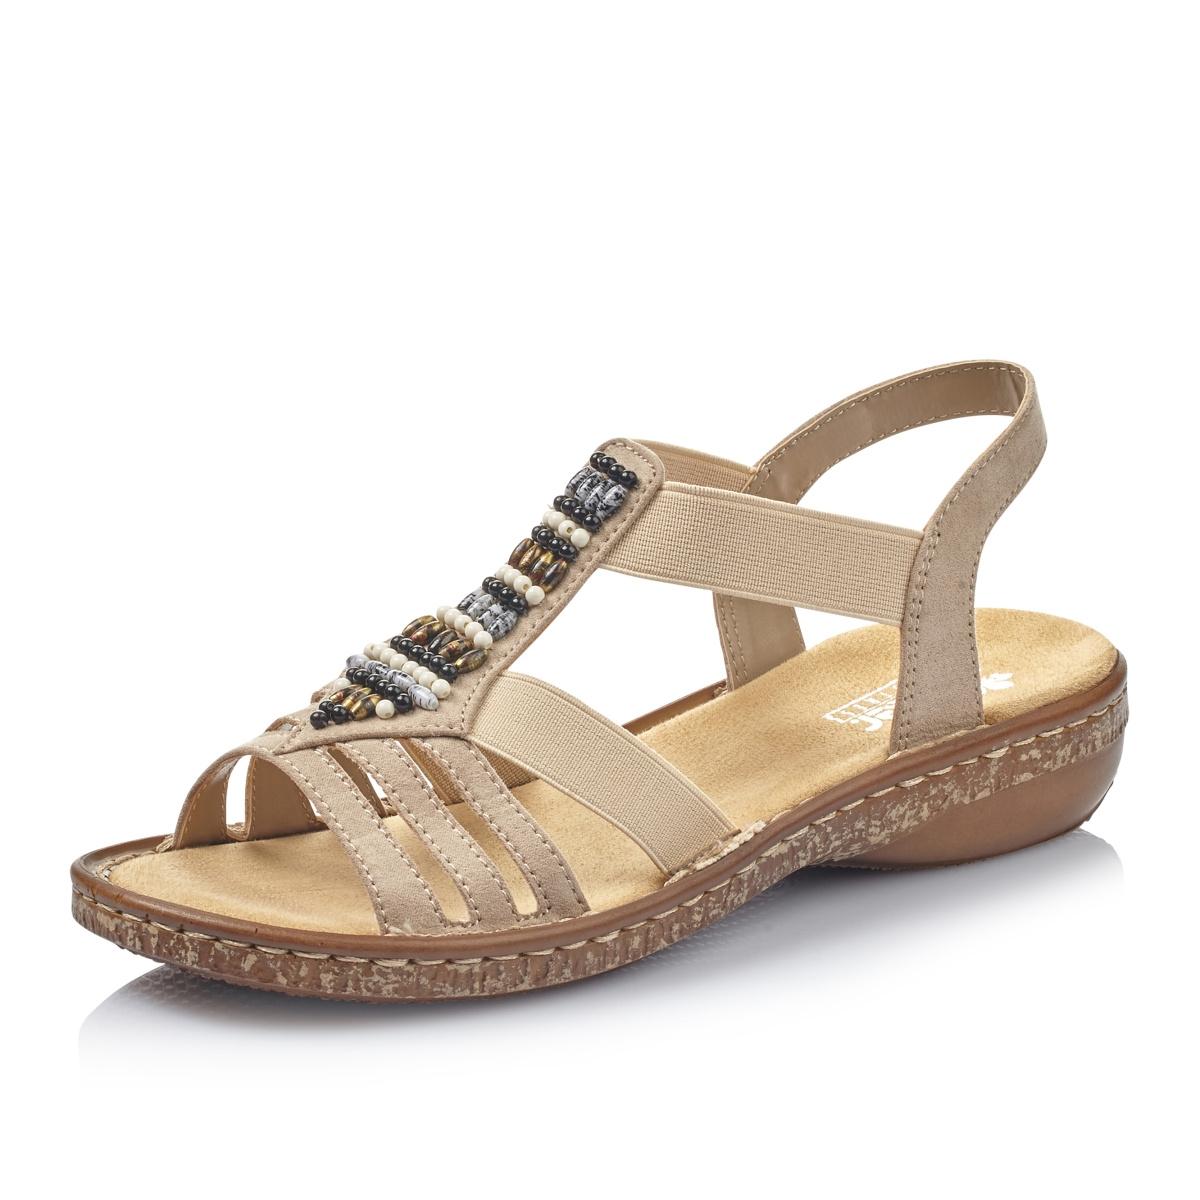 82c1c97f70f Dámská obuv RIEKER62851-60 BEIGE F S 9